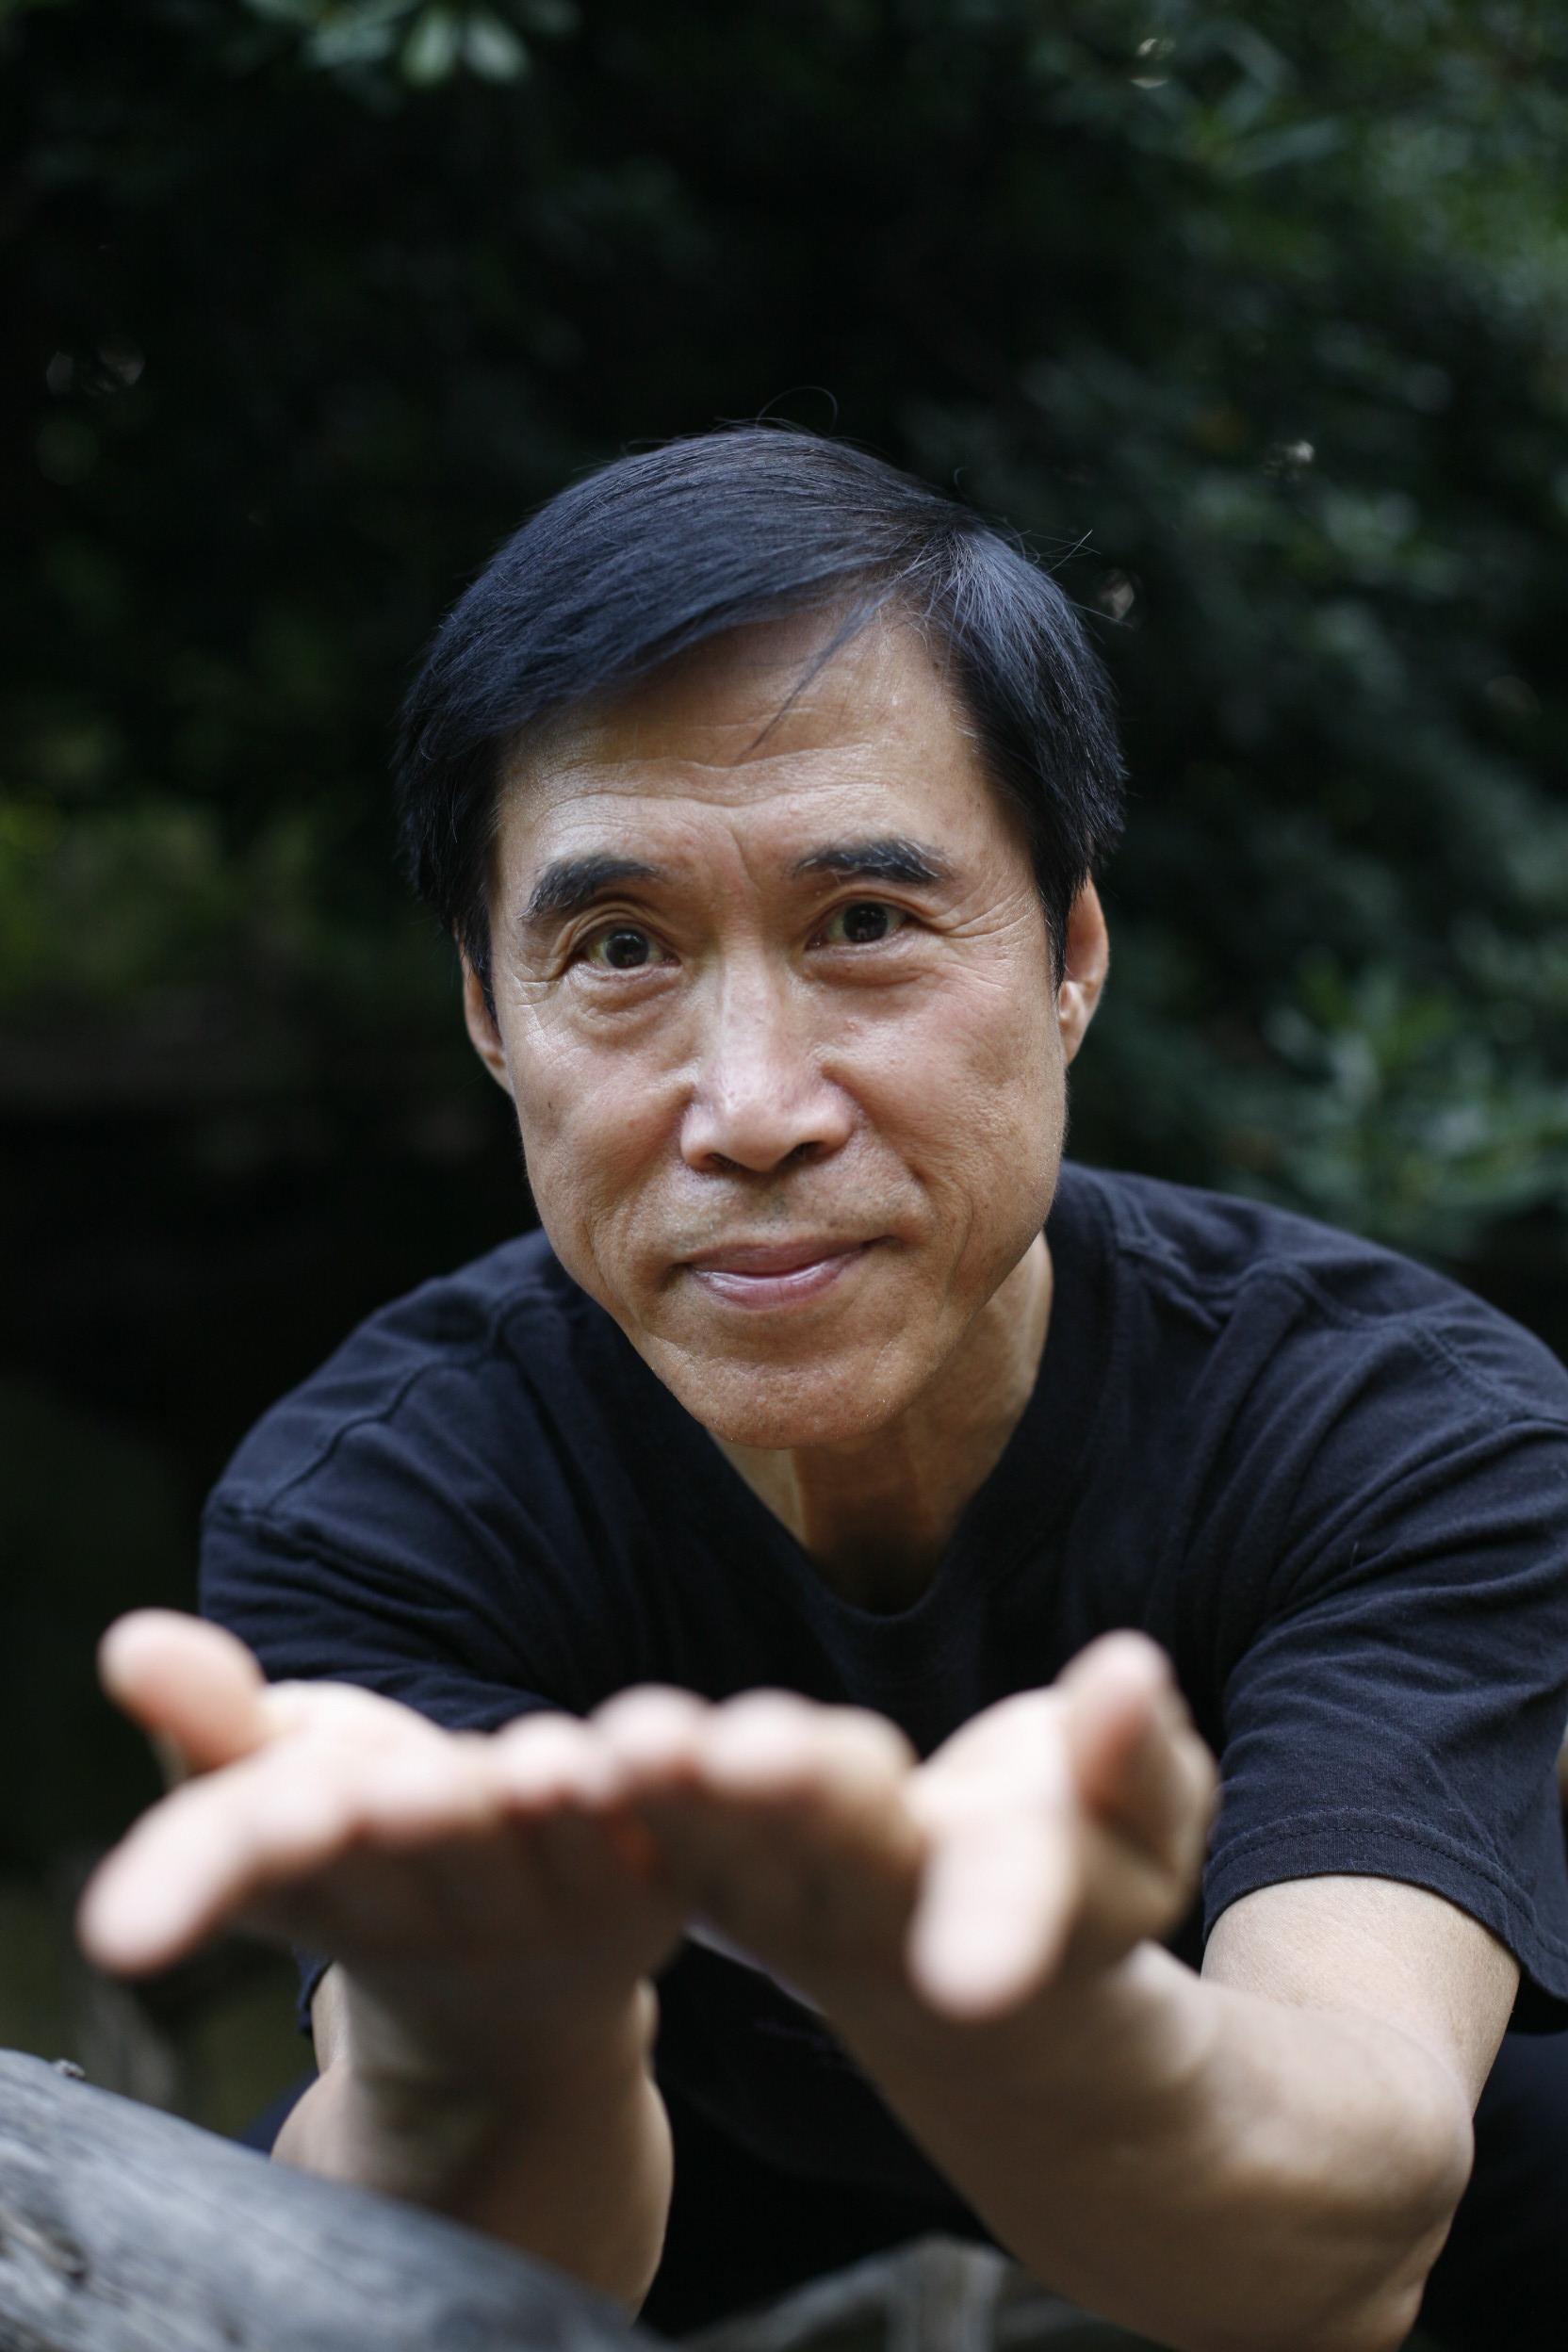 Master Li Junfeng